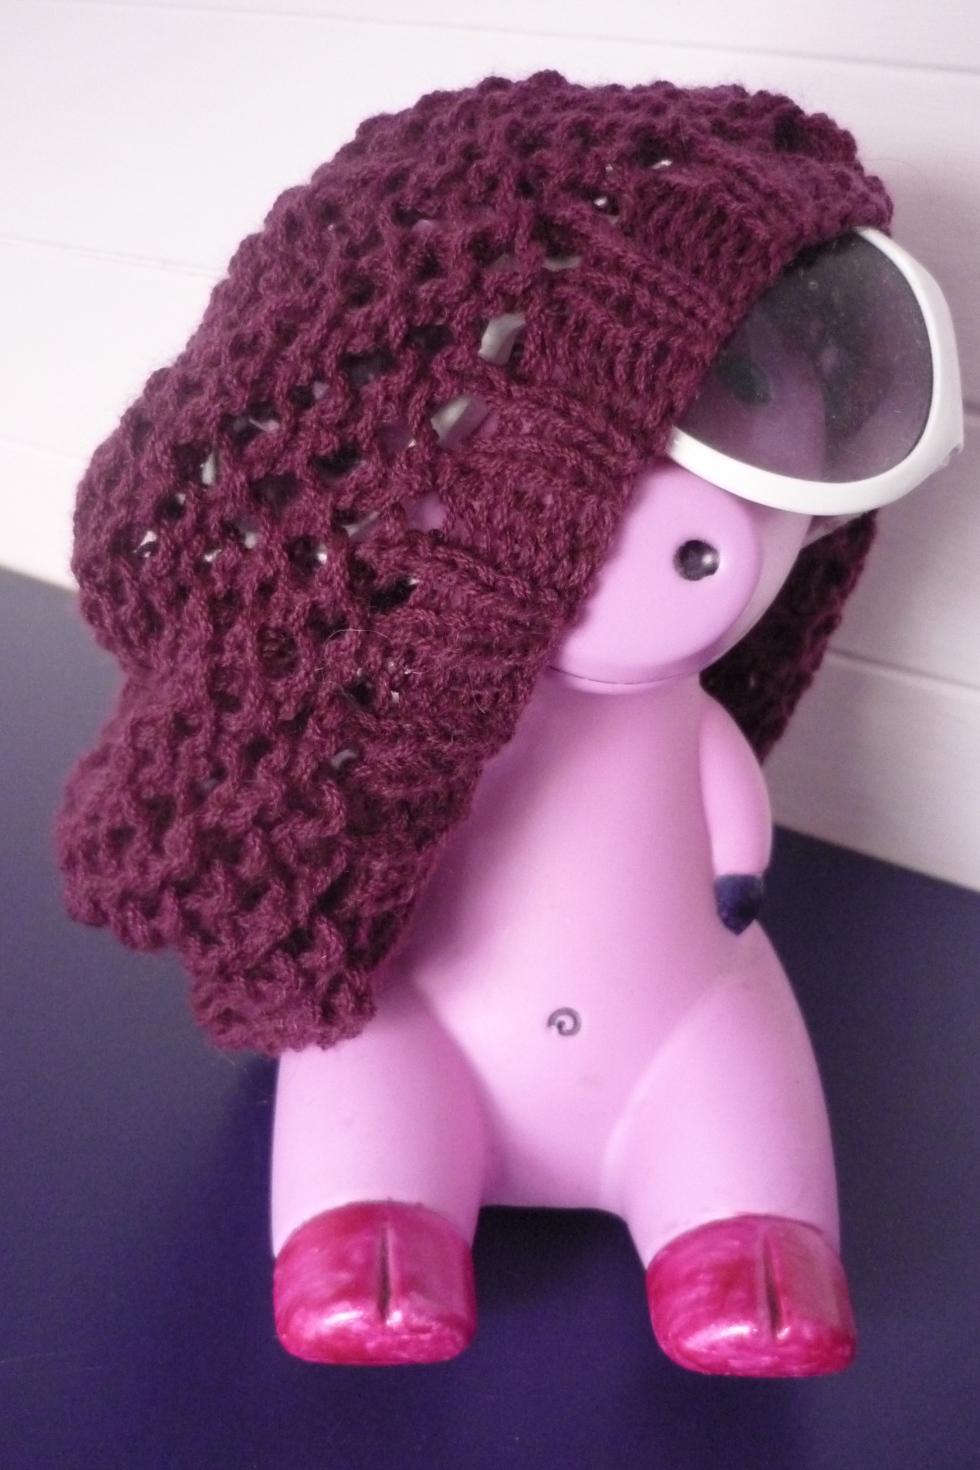 Eyelet hat modelled by the frankly amazing Customised Ikea Piggy Bank of Awesomeness